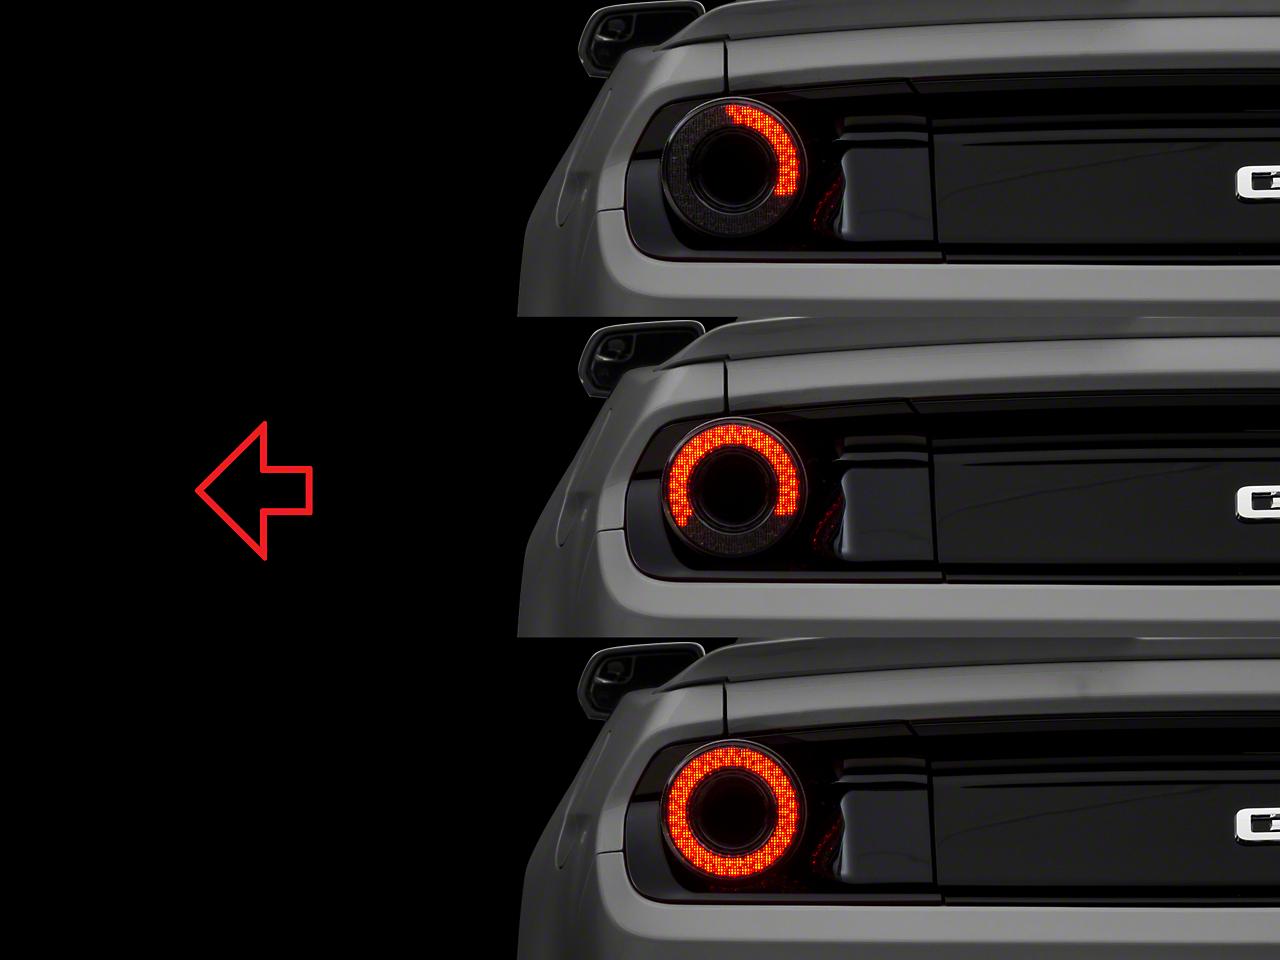 Raxiom Halo LED Tail Light - Smoked (15-17 All)